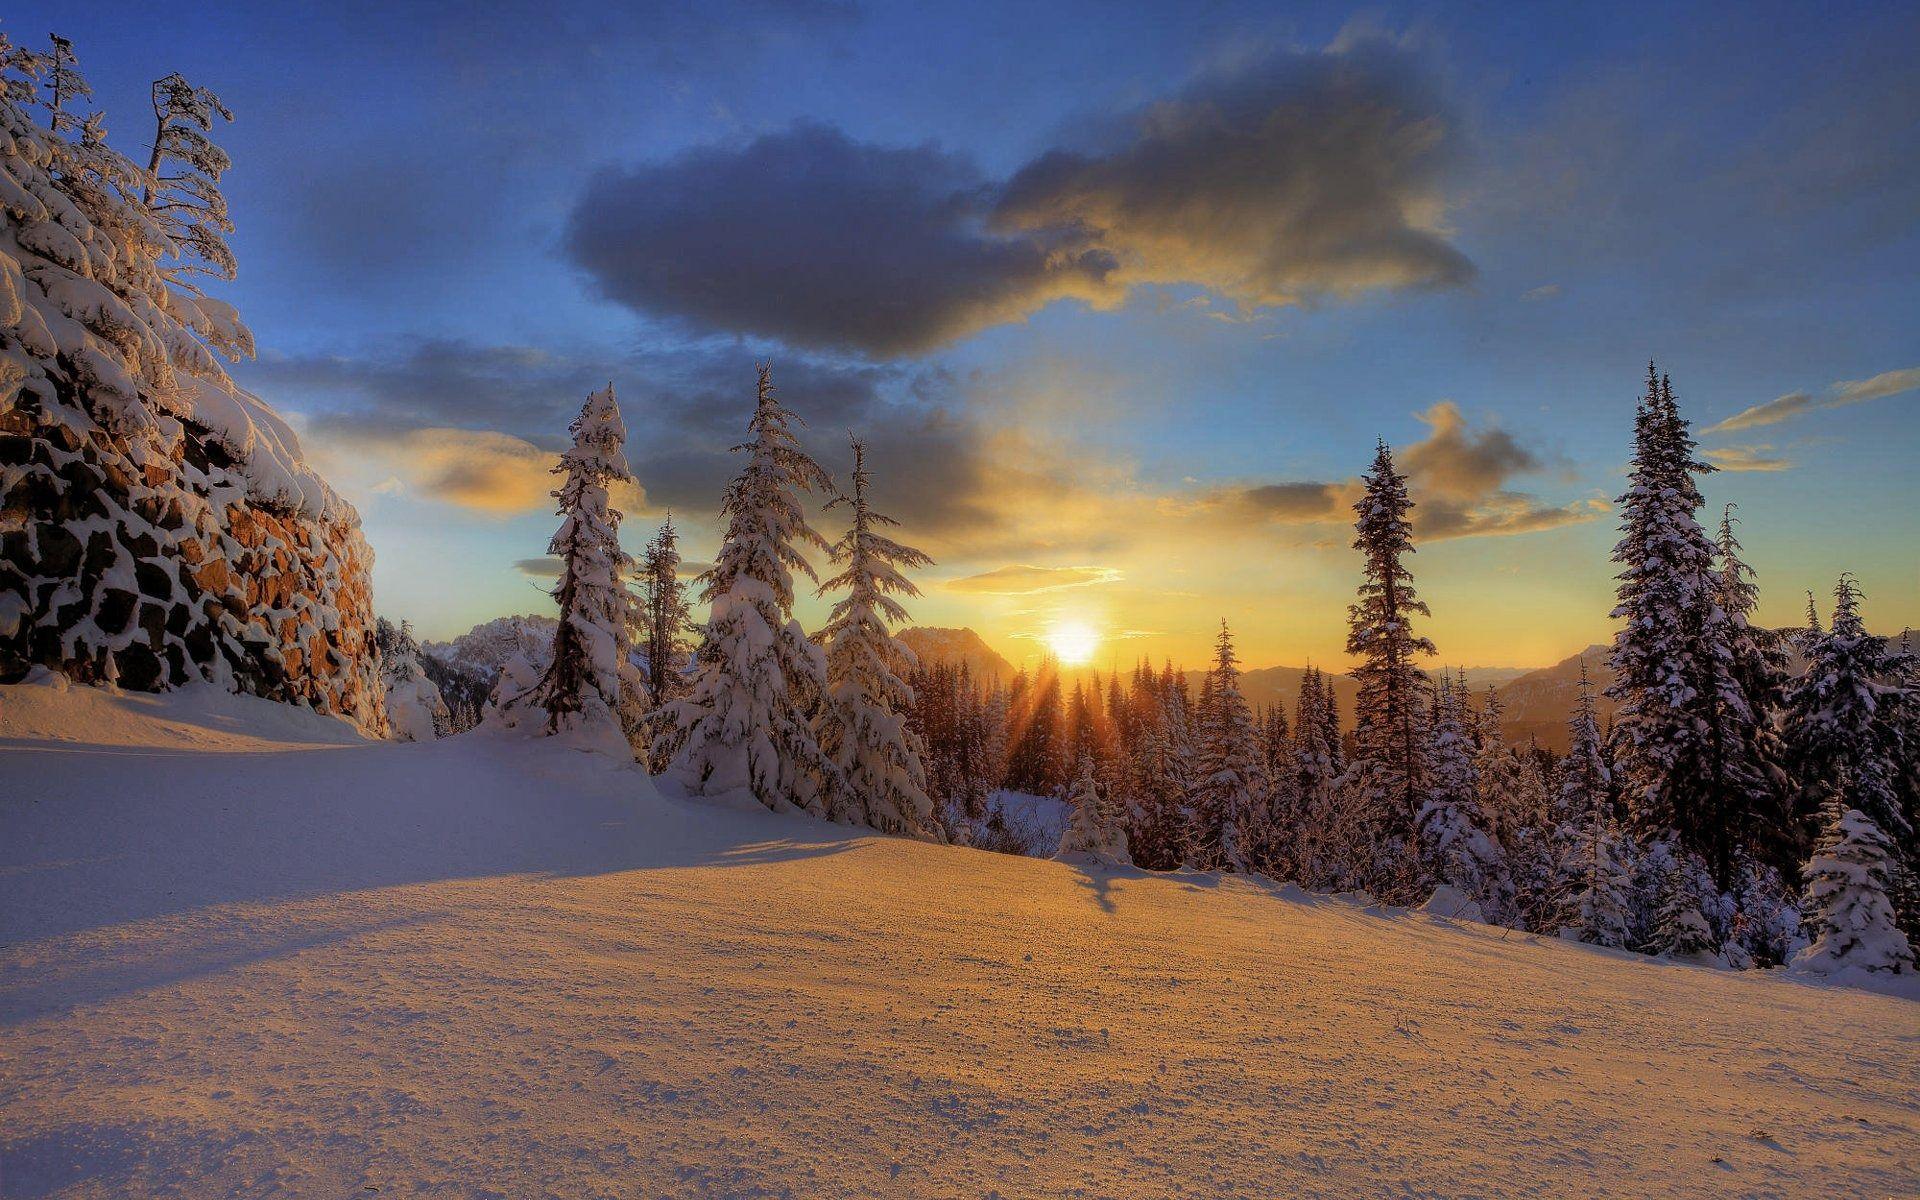 Beautiful Snowflake In The Sunlight: Winter Sunset Desktop Backgrounds 124 Winter Sunset